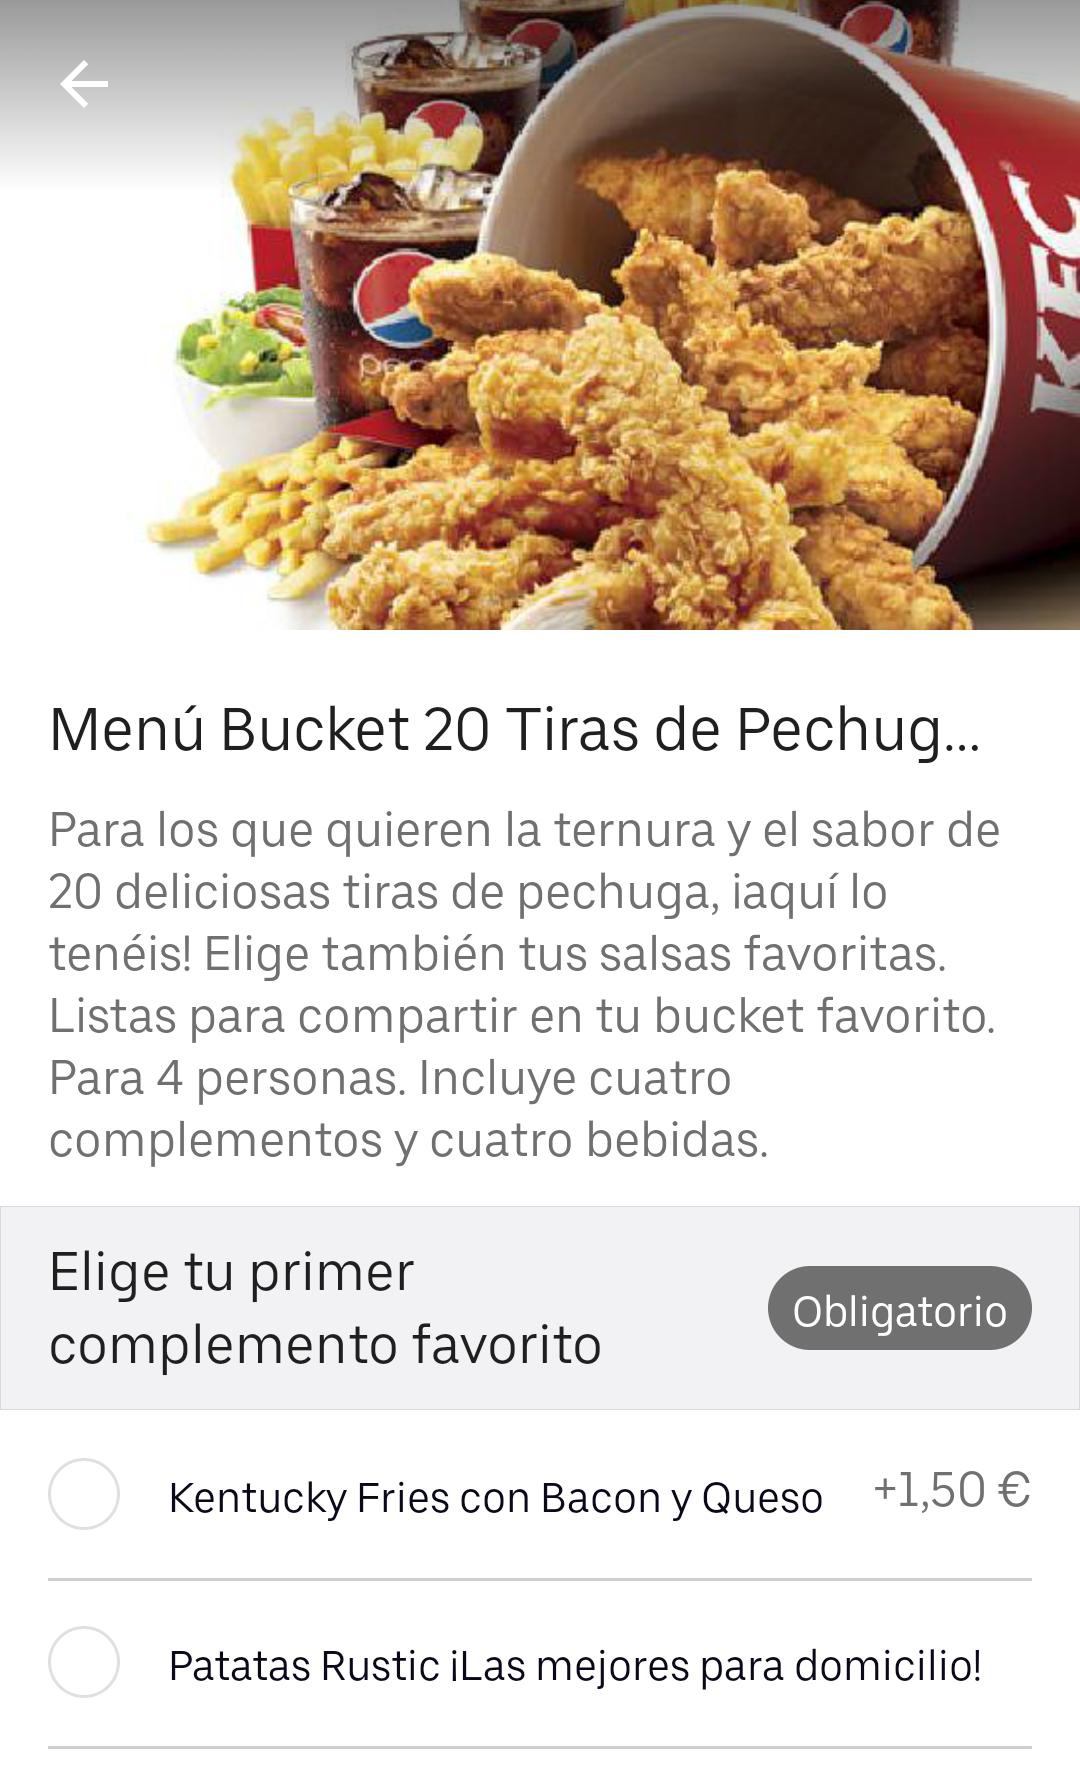 Uber Eats KFC 4 bebidas gratis